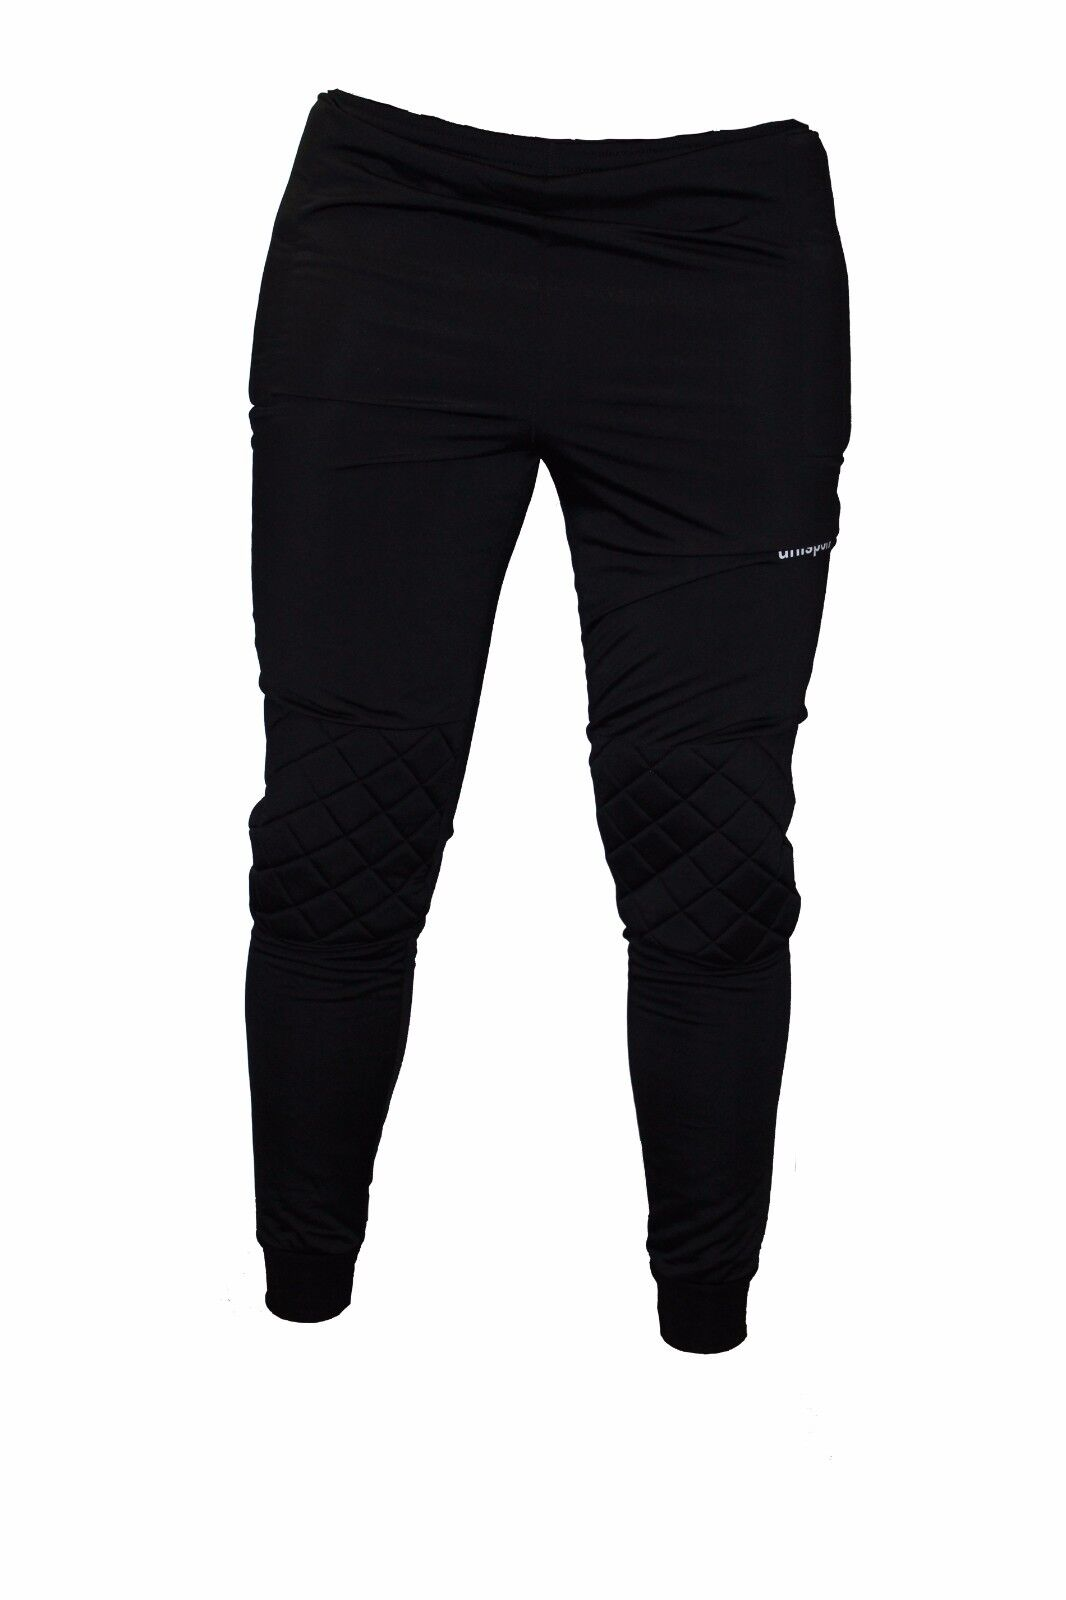 Pantalone Portiere calcio bambino Uhlsport